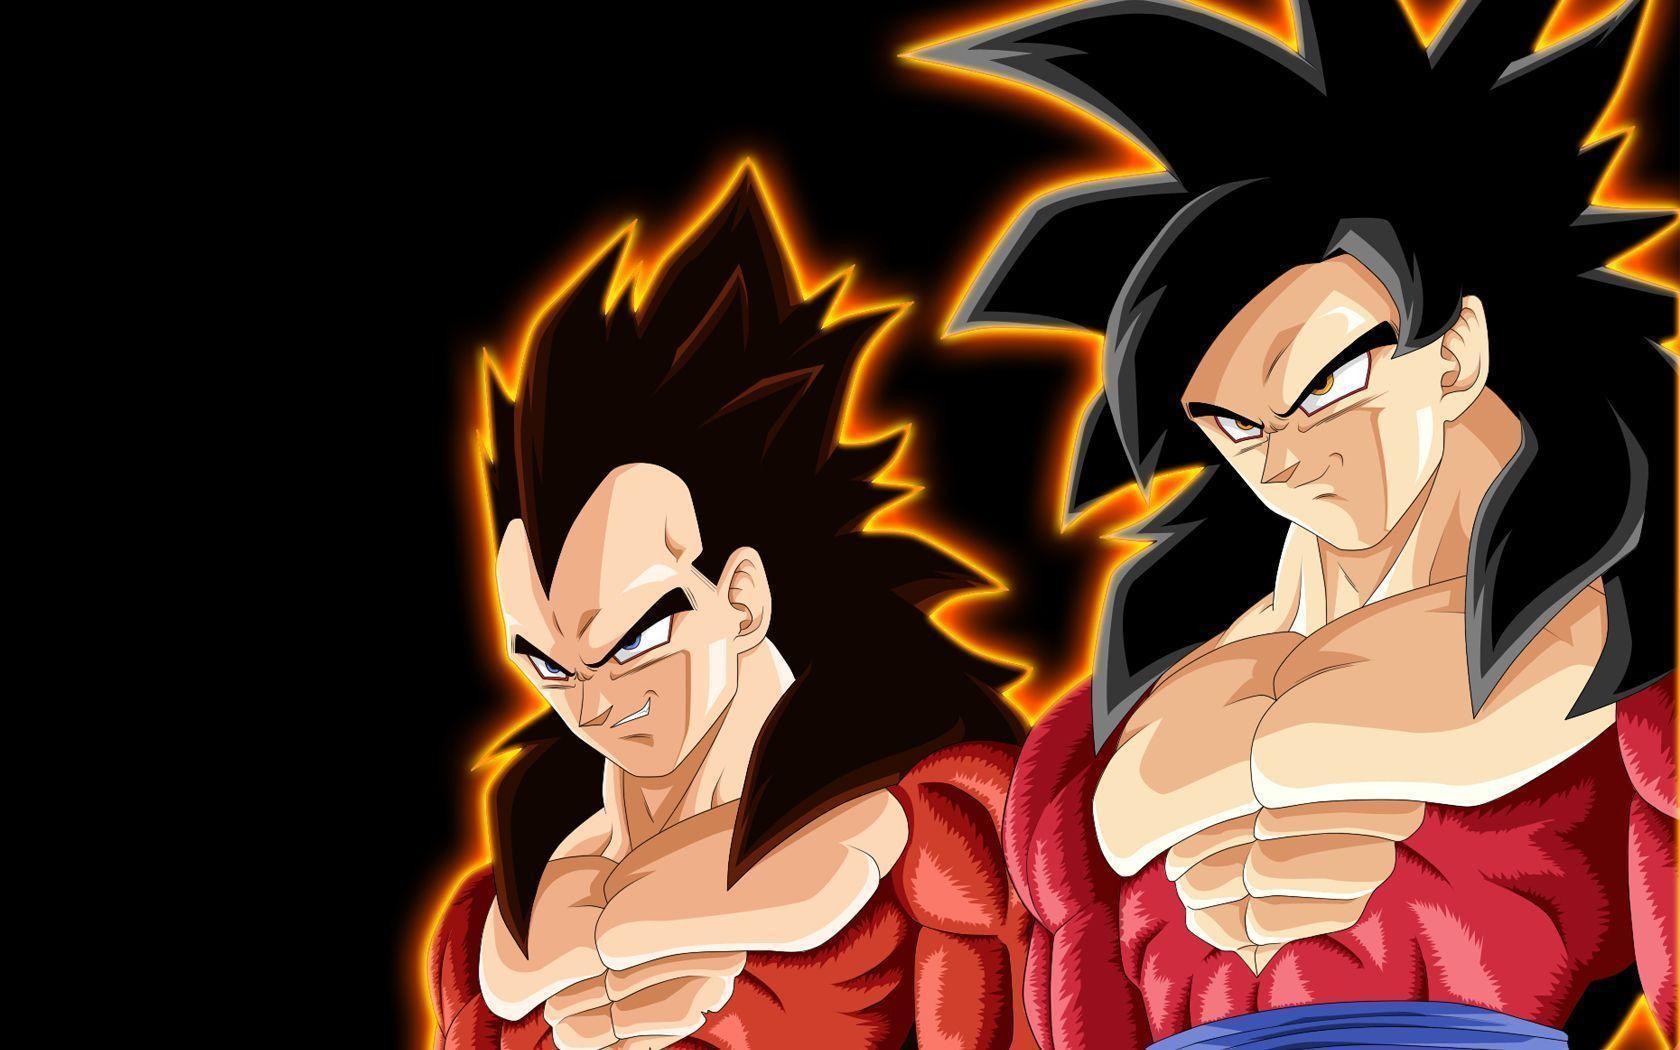 Dragon Ball Z Wallpaper Goku Super Saiyan Posted By Zoey Mercado